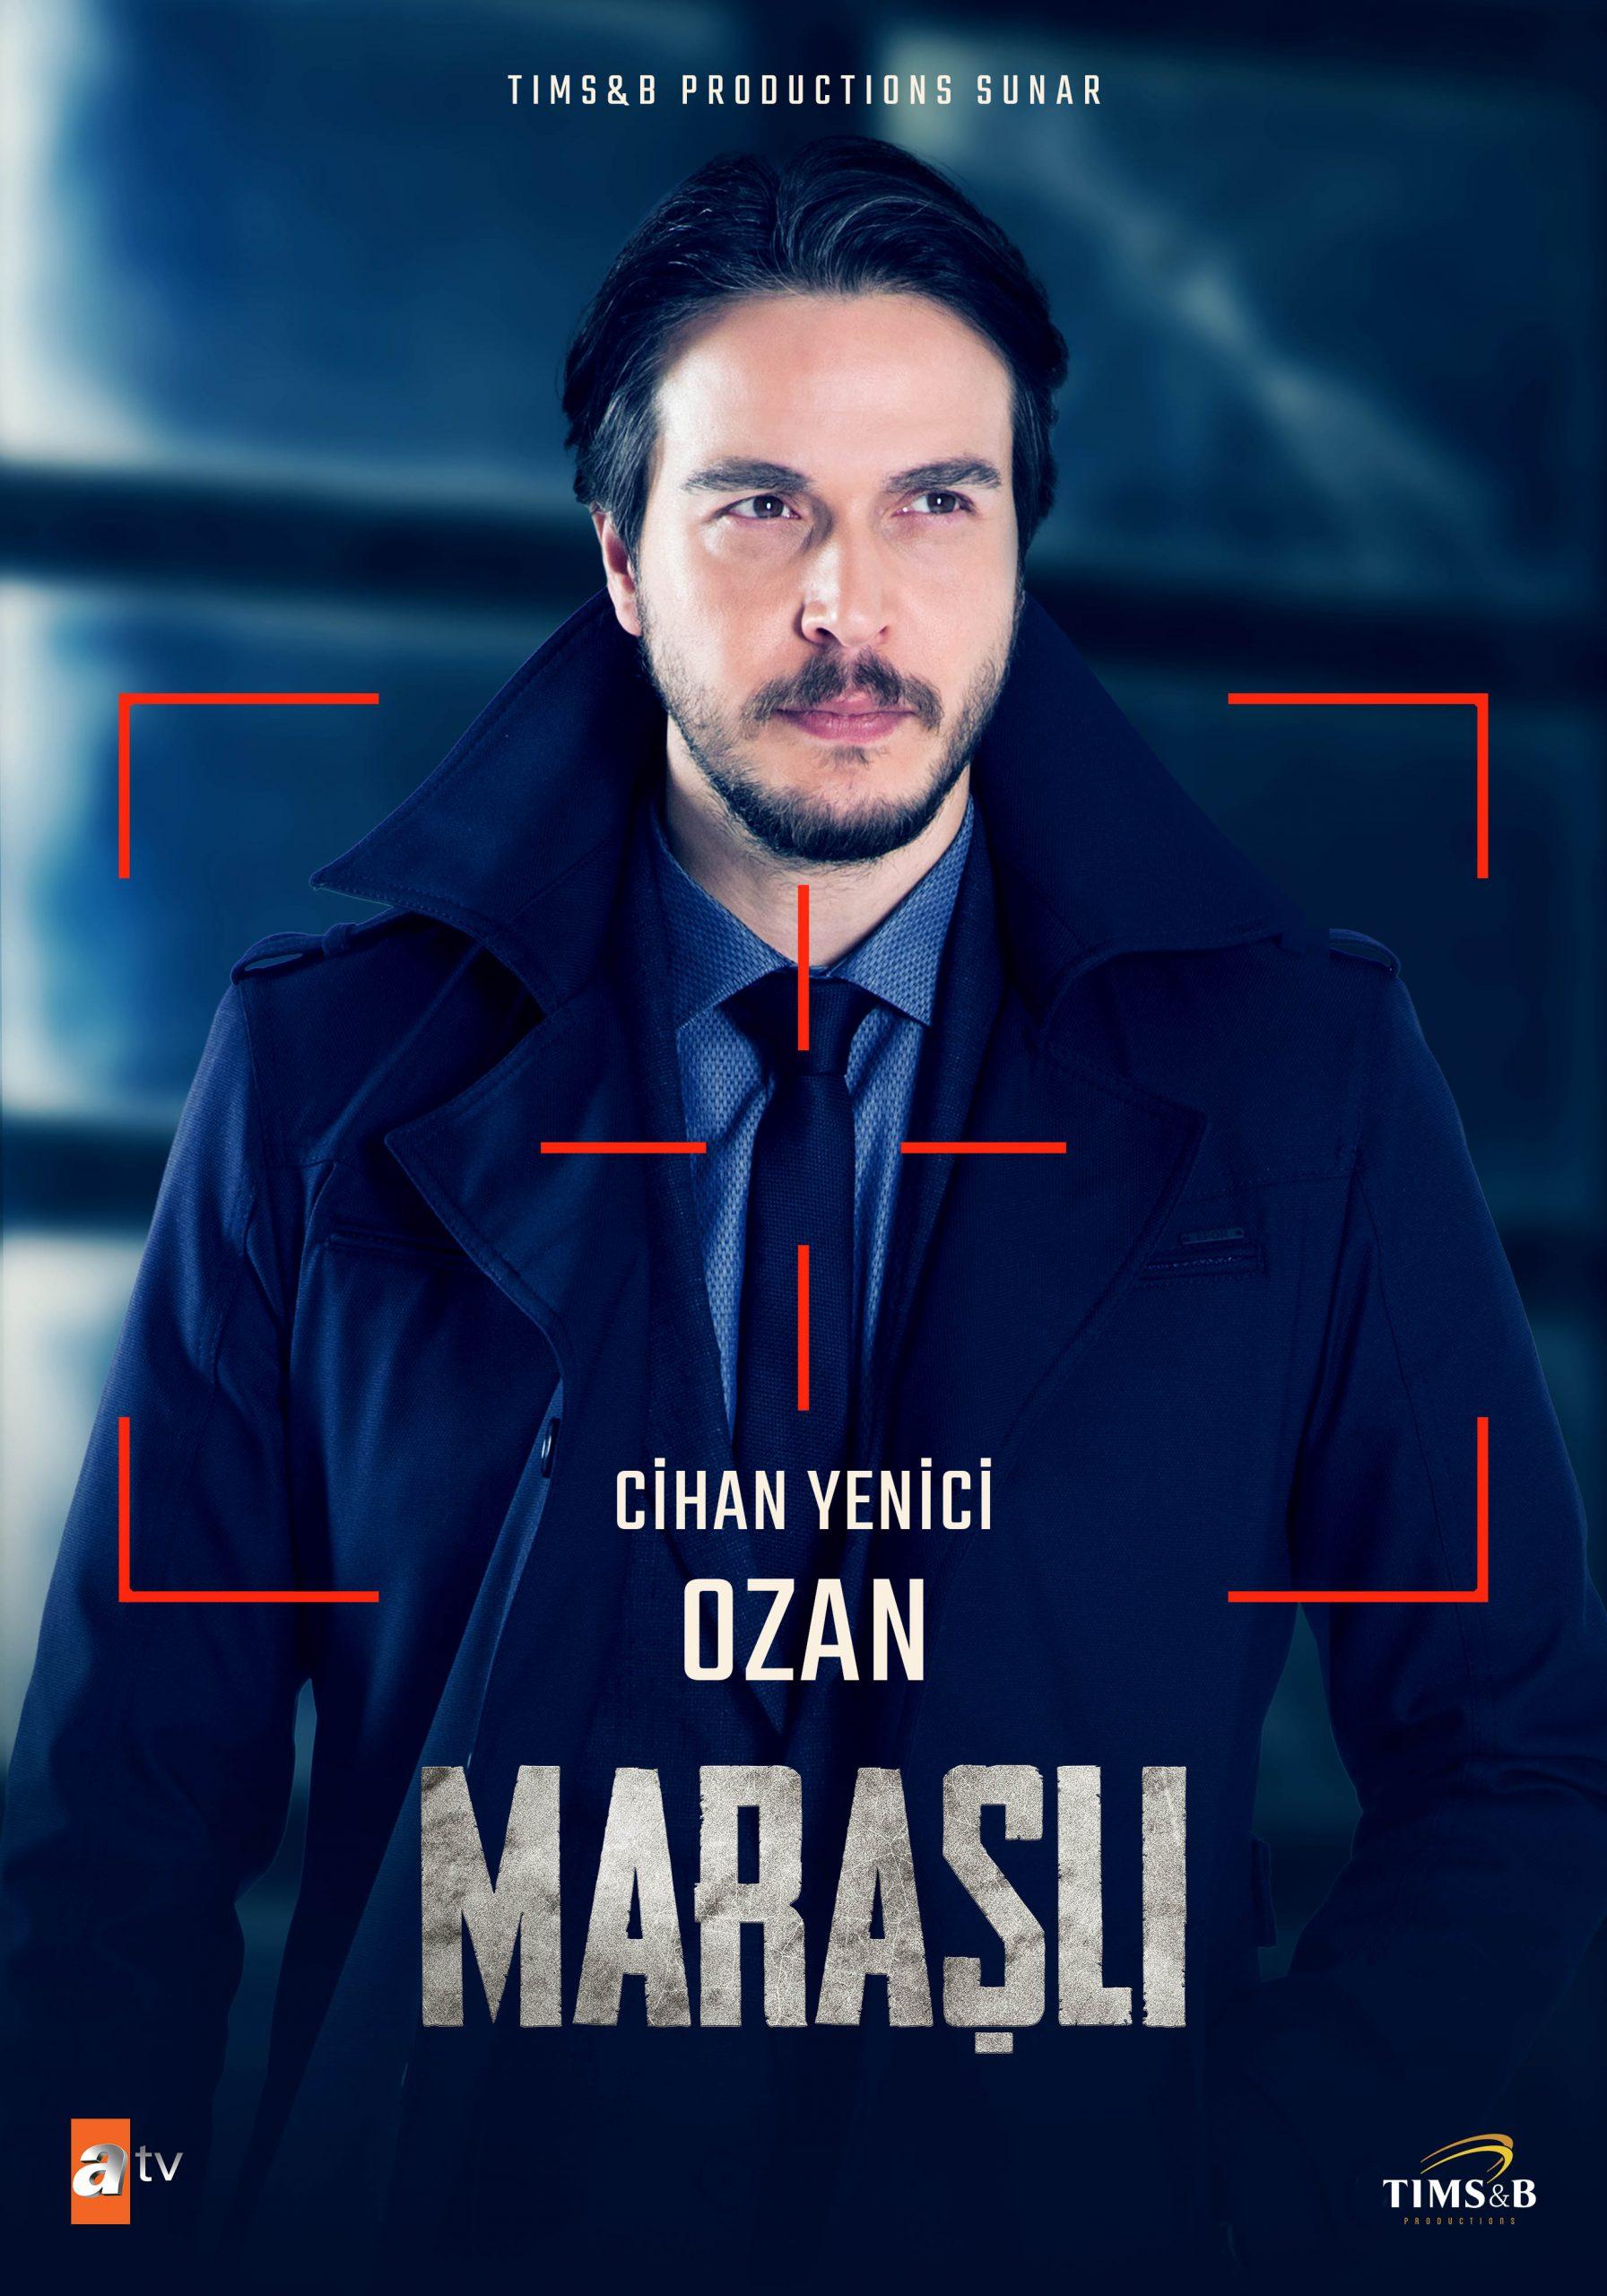 MARASLI_K_OZAN_M-scaled